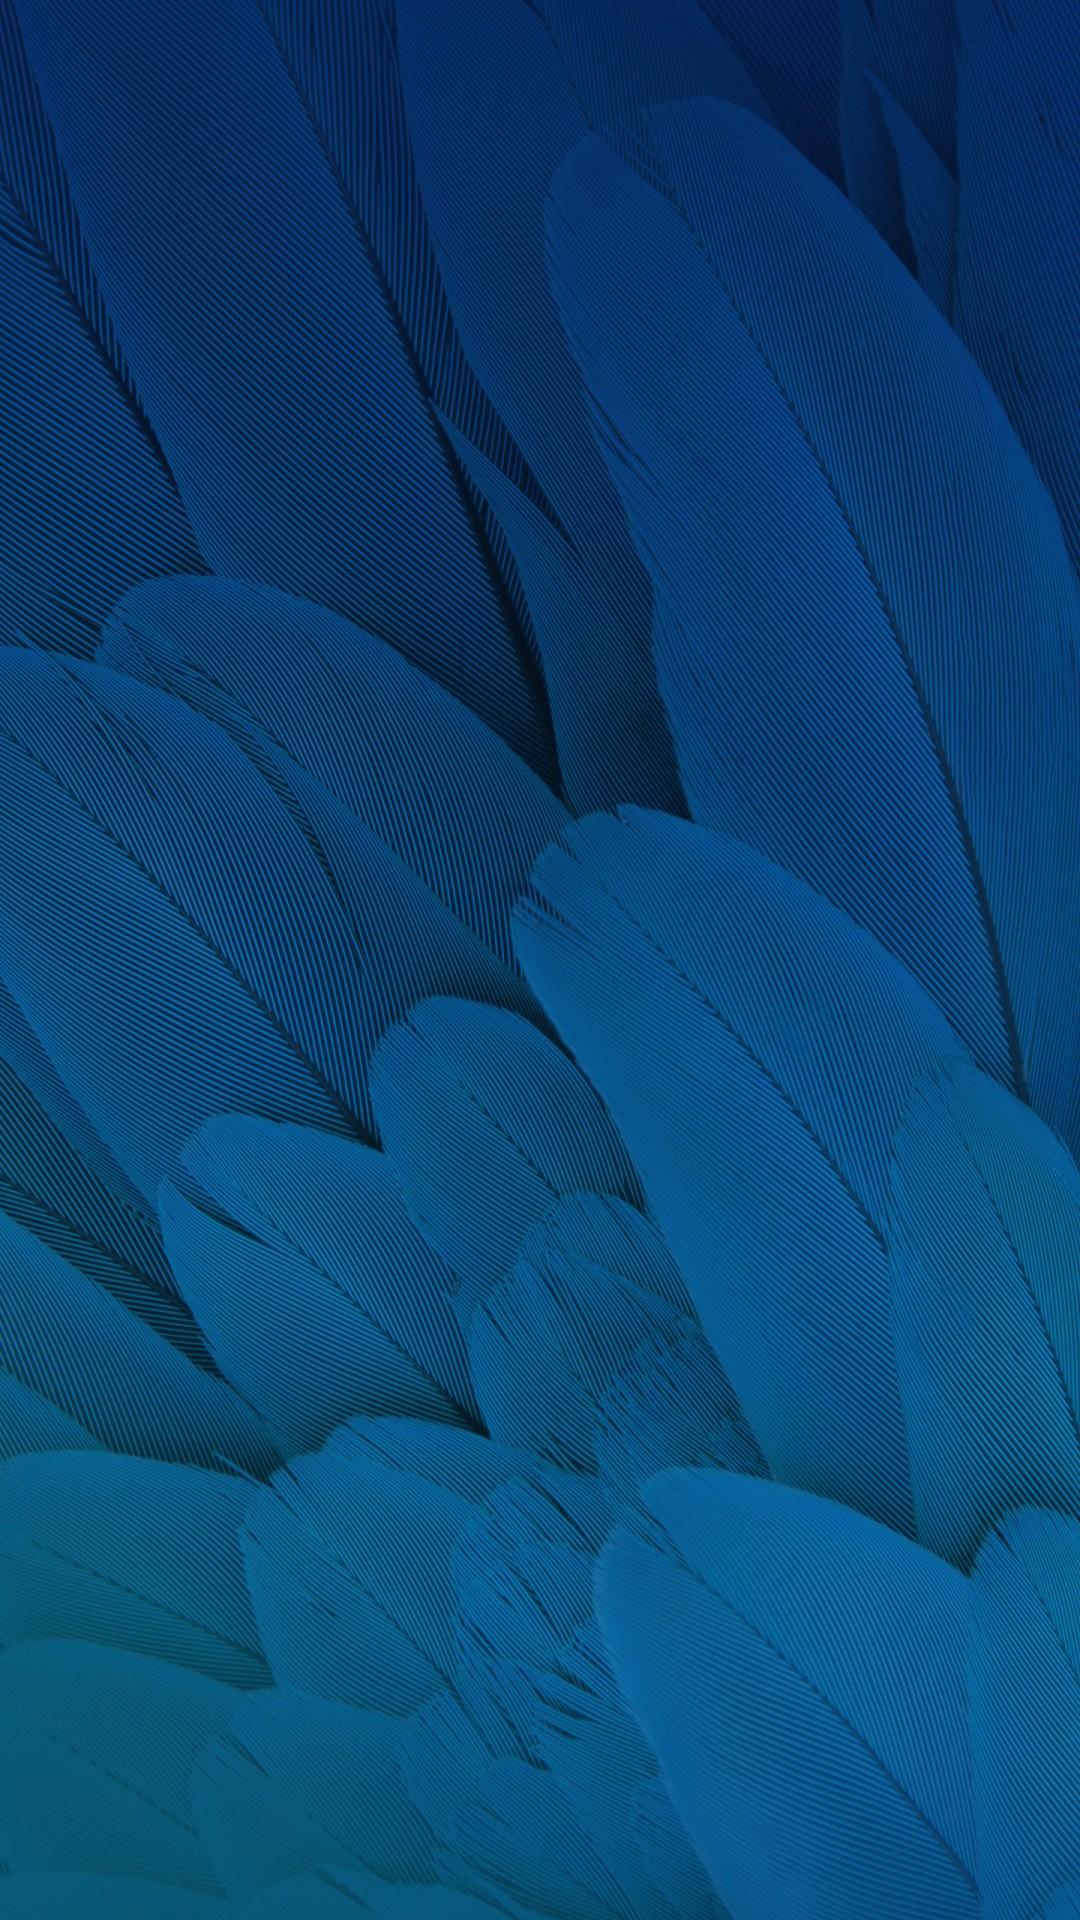 Kylo Ren Wallpaper Iphone X Feathers Moto X Play Stock Hd Wallpapers Hd Wallpapers